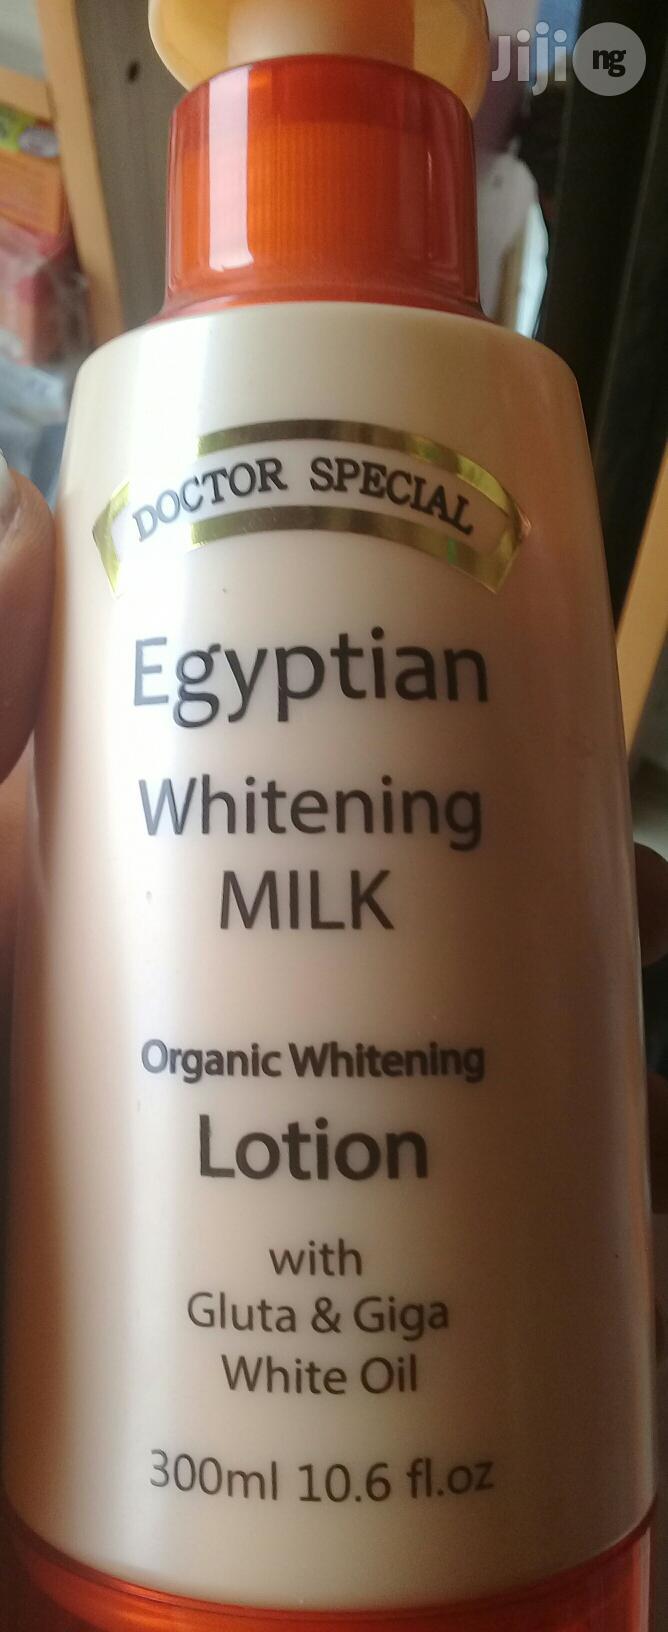 Egyptian Whitening Milk